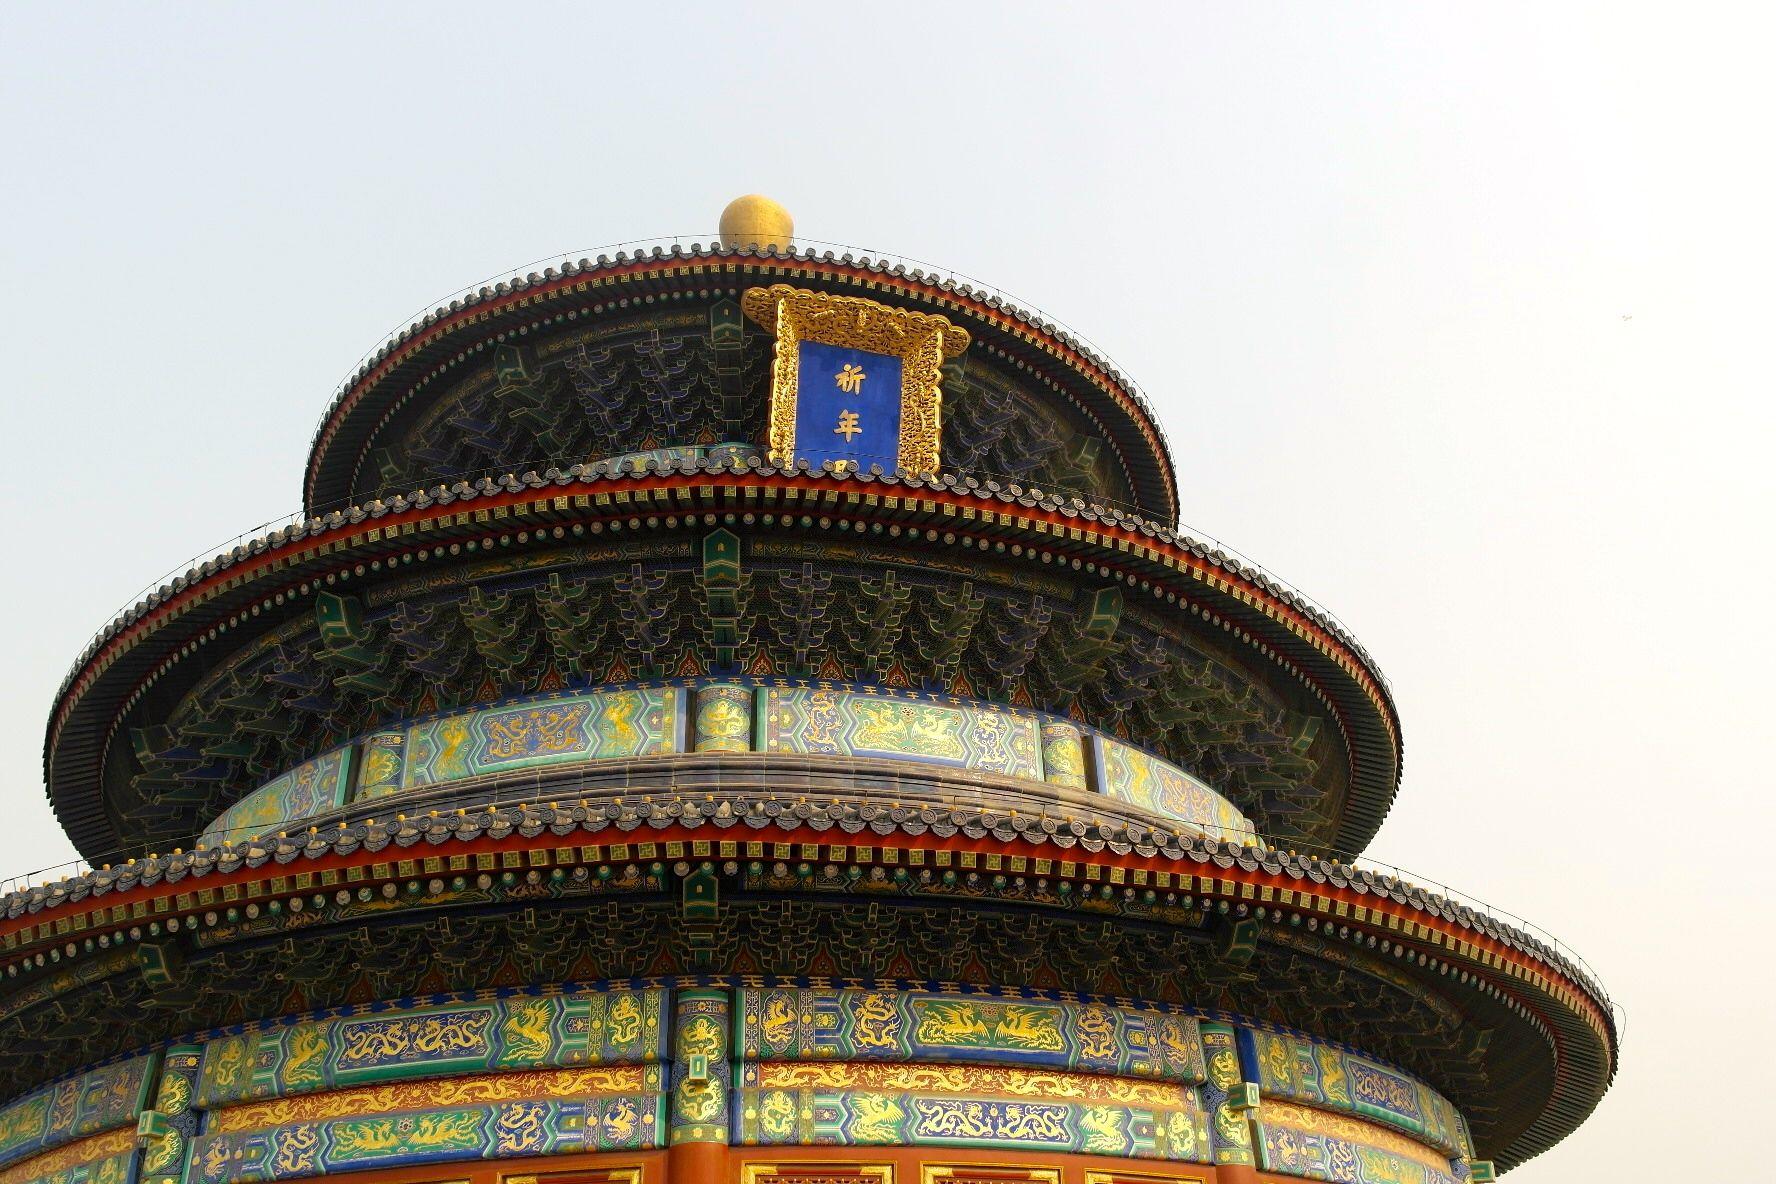 Temple of Heaven. Beijing, China